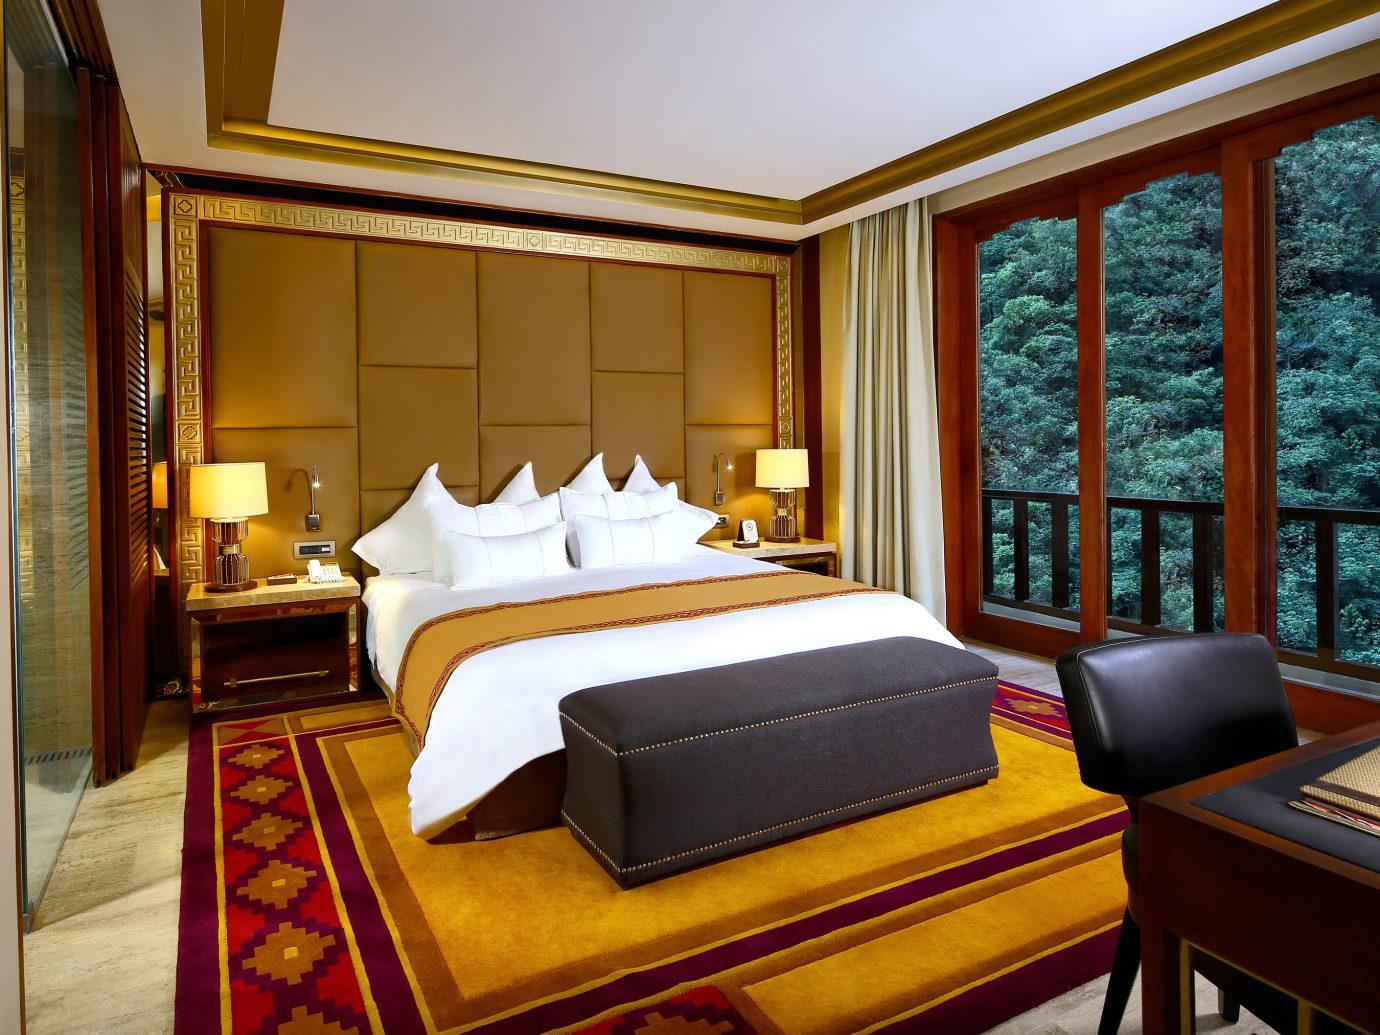 Imperial Suite at the SUMAQ Machu Picchu